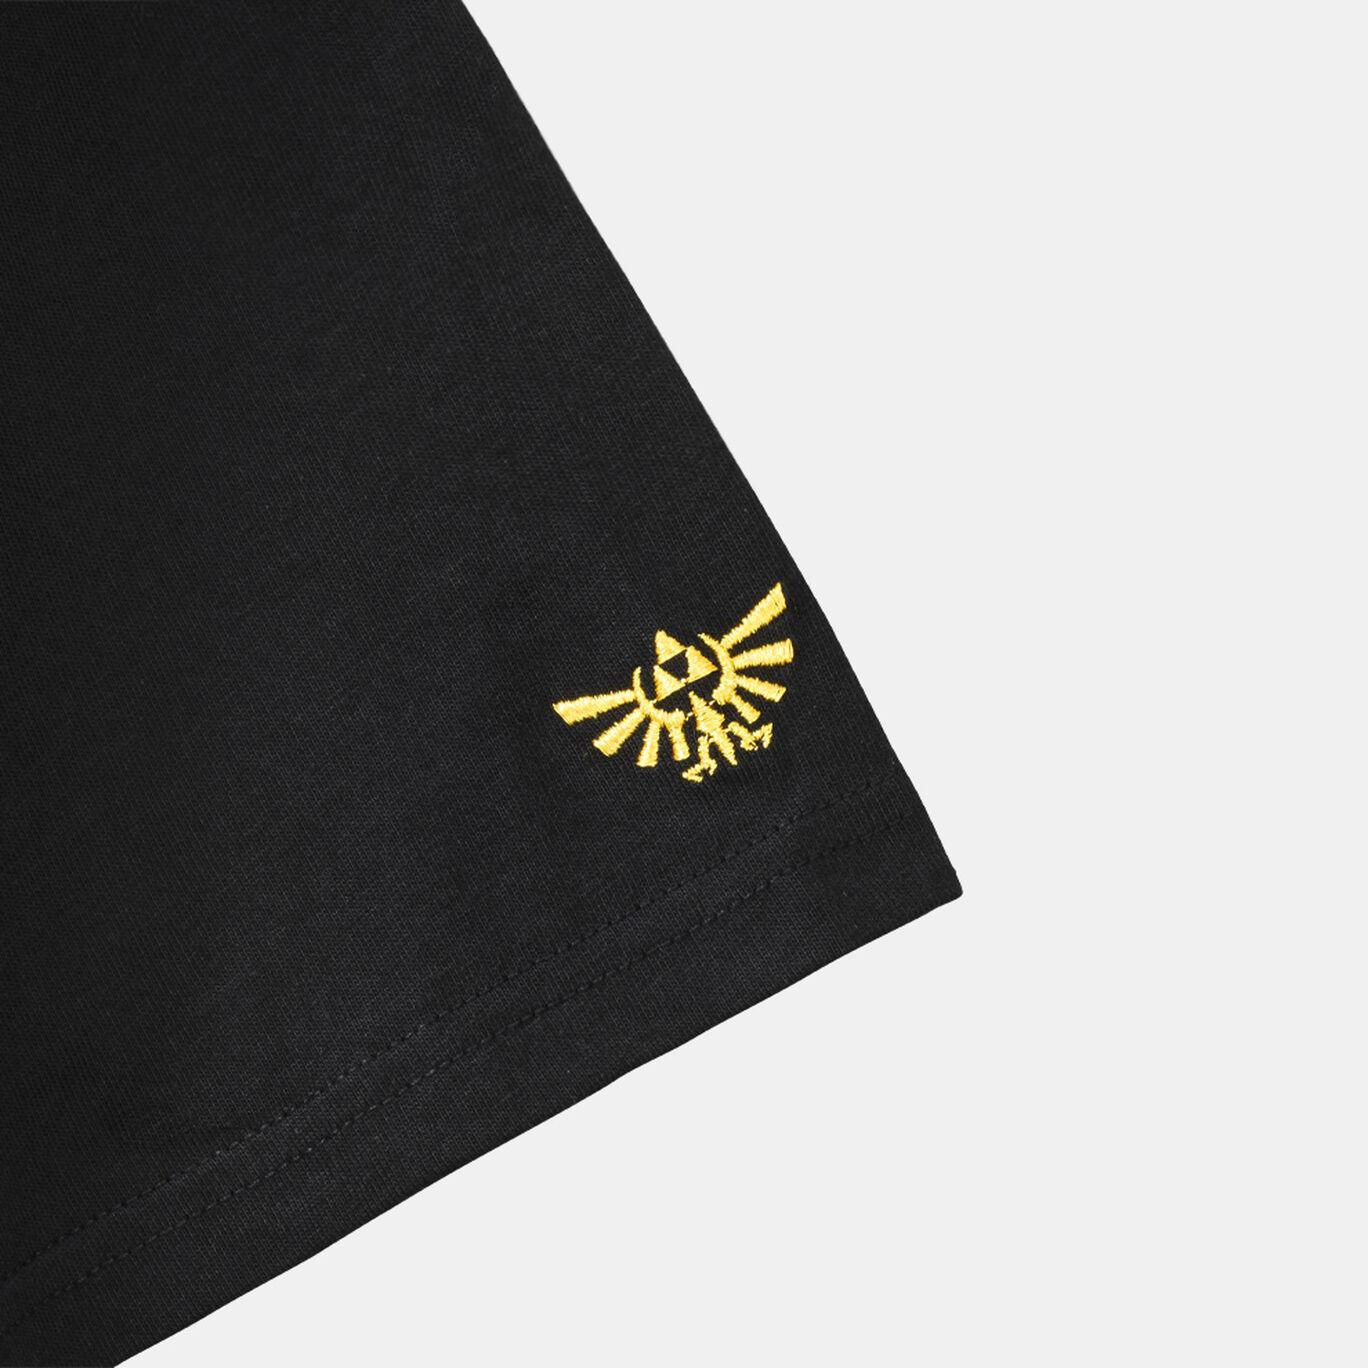 Tシャツ トライフォース ガノンドロフ S ゼルダの伝説【Nintendo TOKYO取り扱い商品】